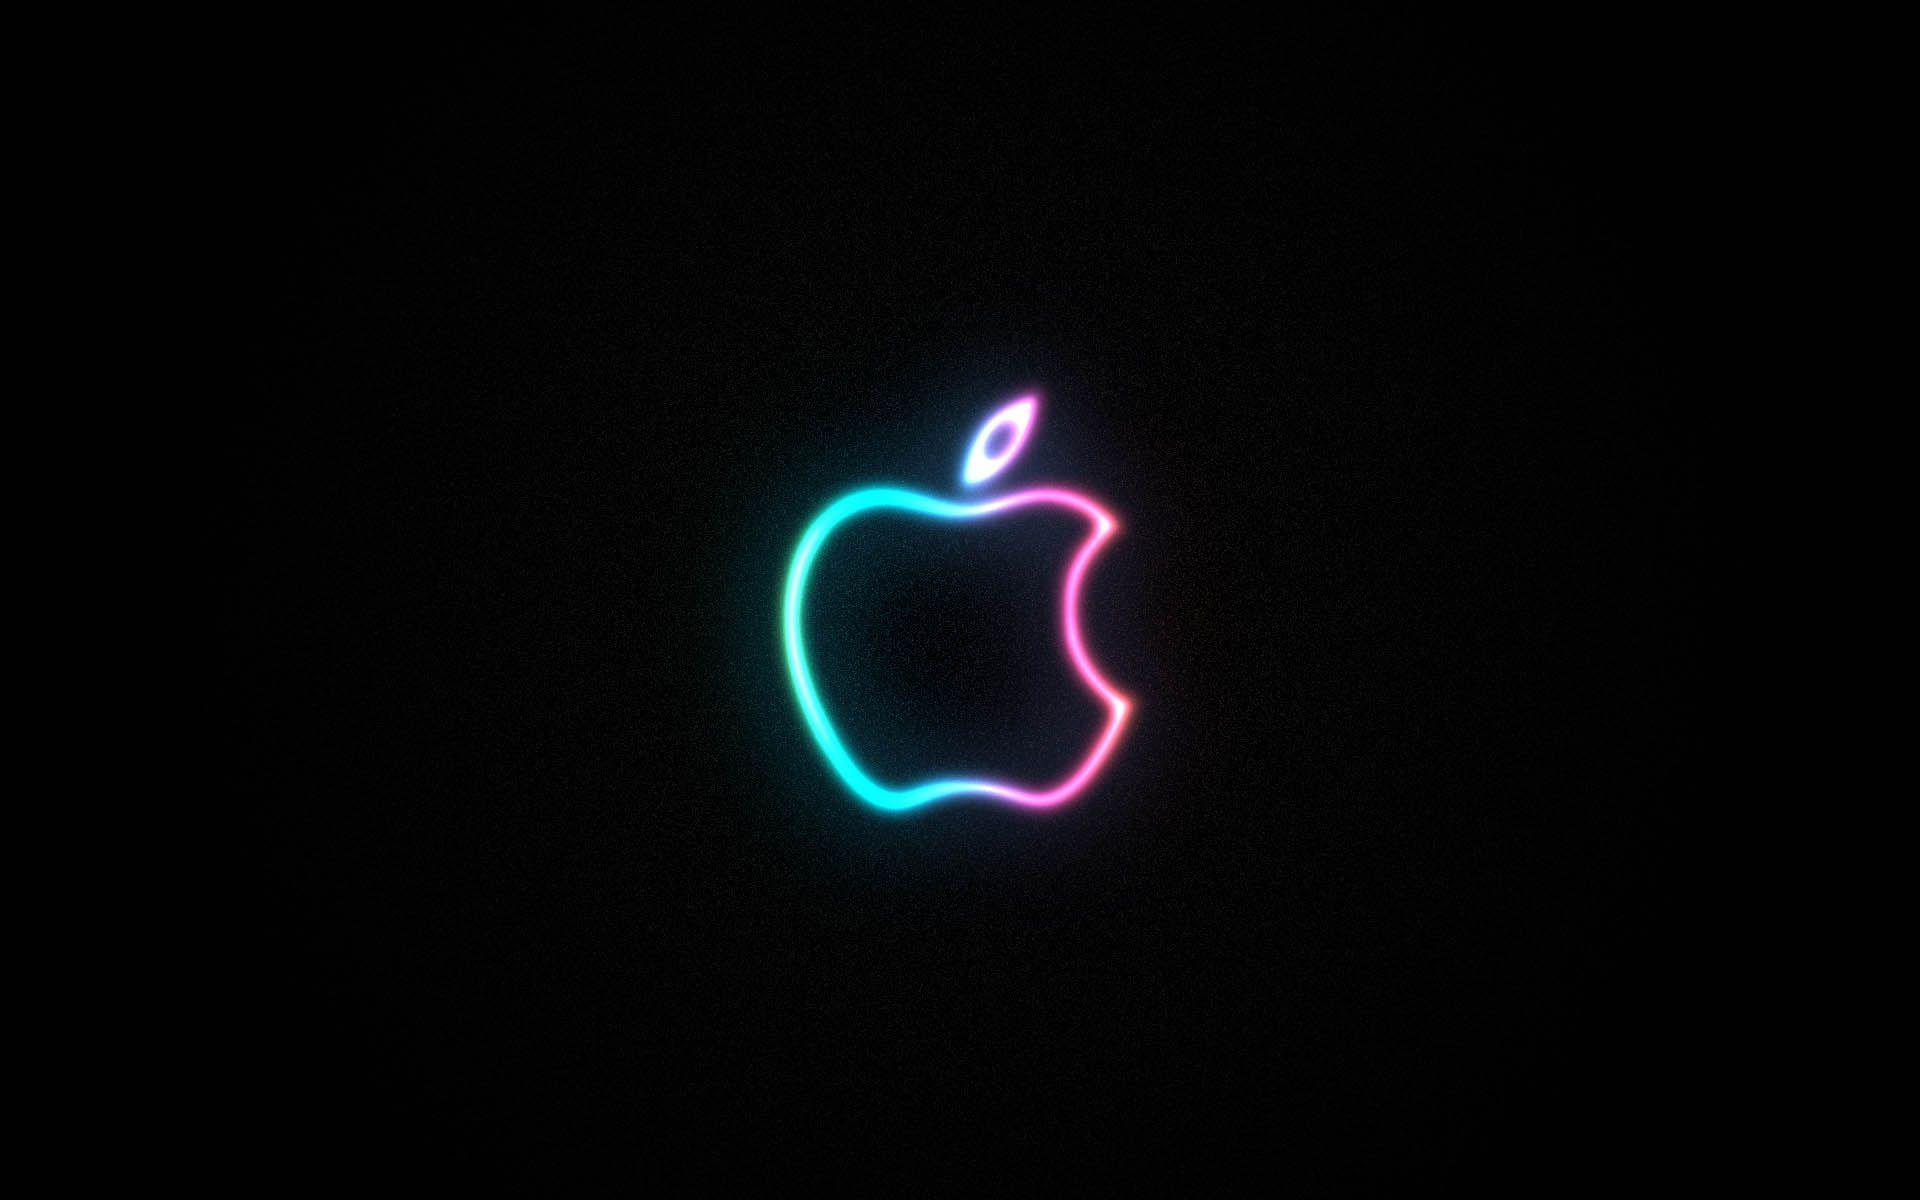 Unduh 4000 Wallpaper Apple Nba  Paling Baru